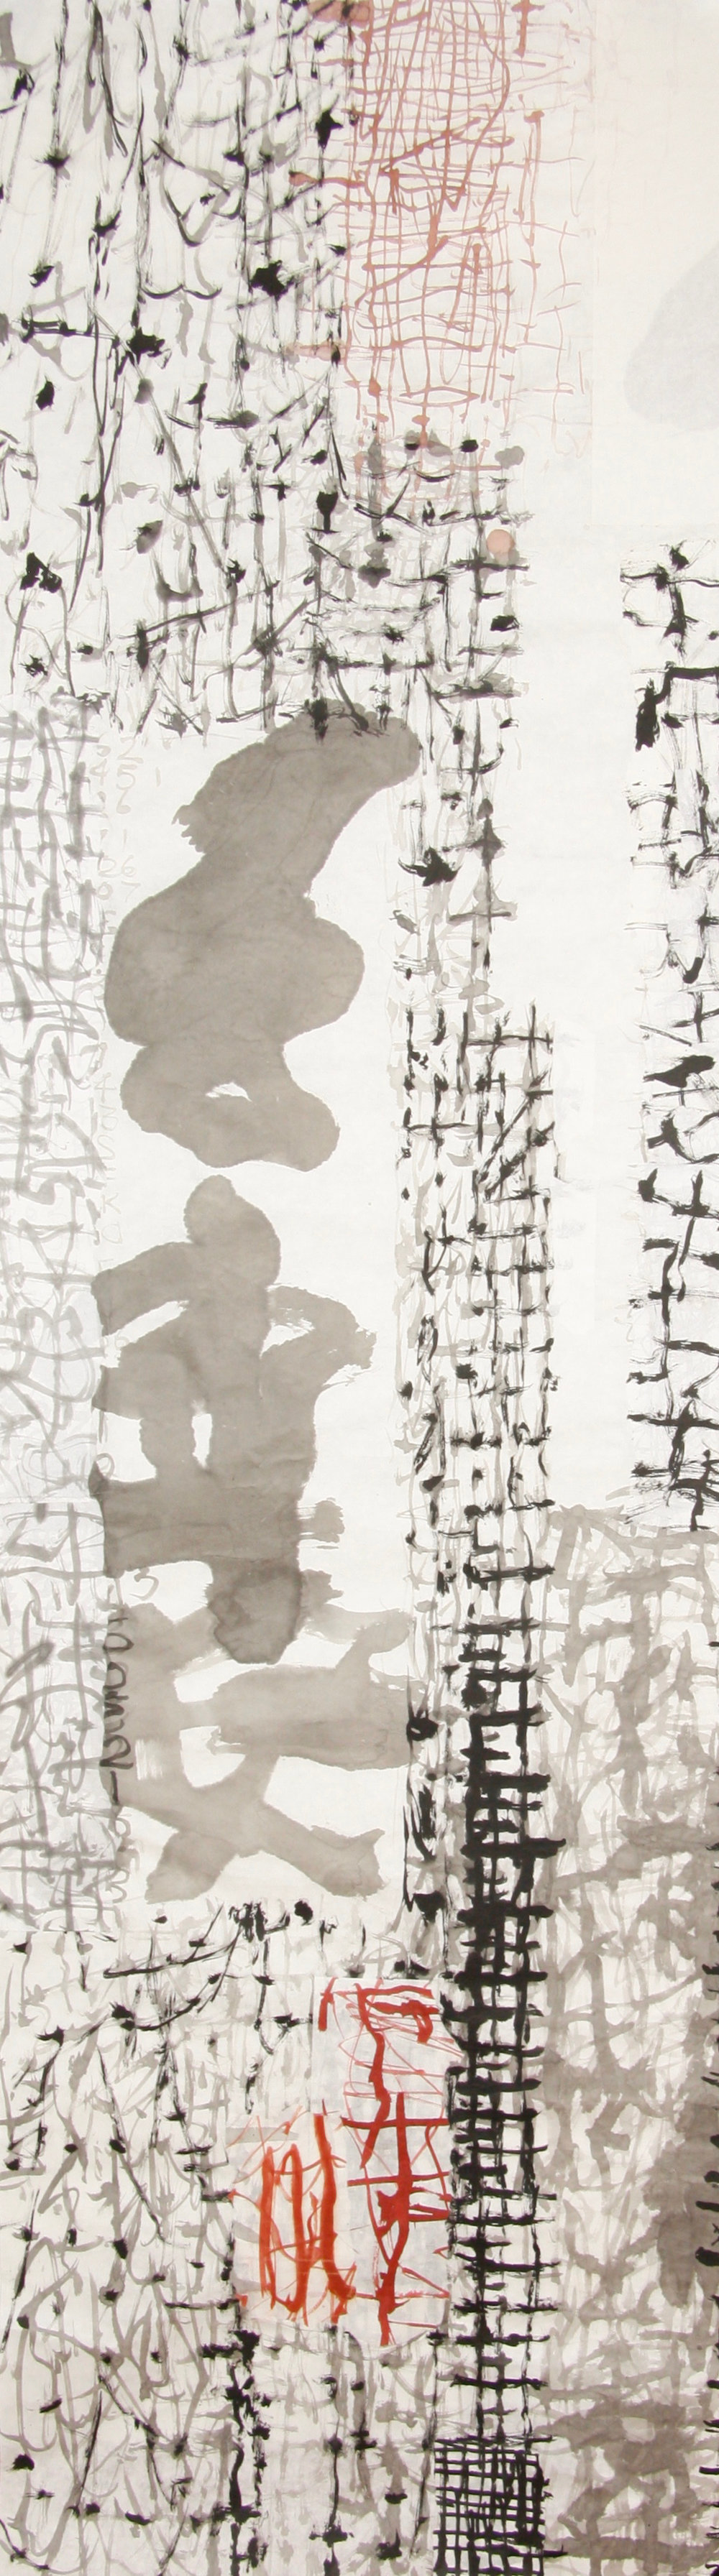 2018 2nd January 178cmx53cm ink on ricepaper large.jpg